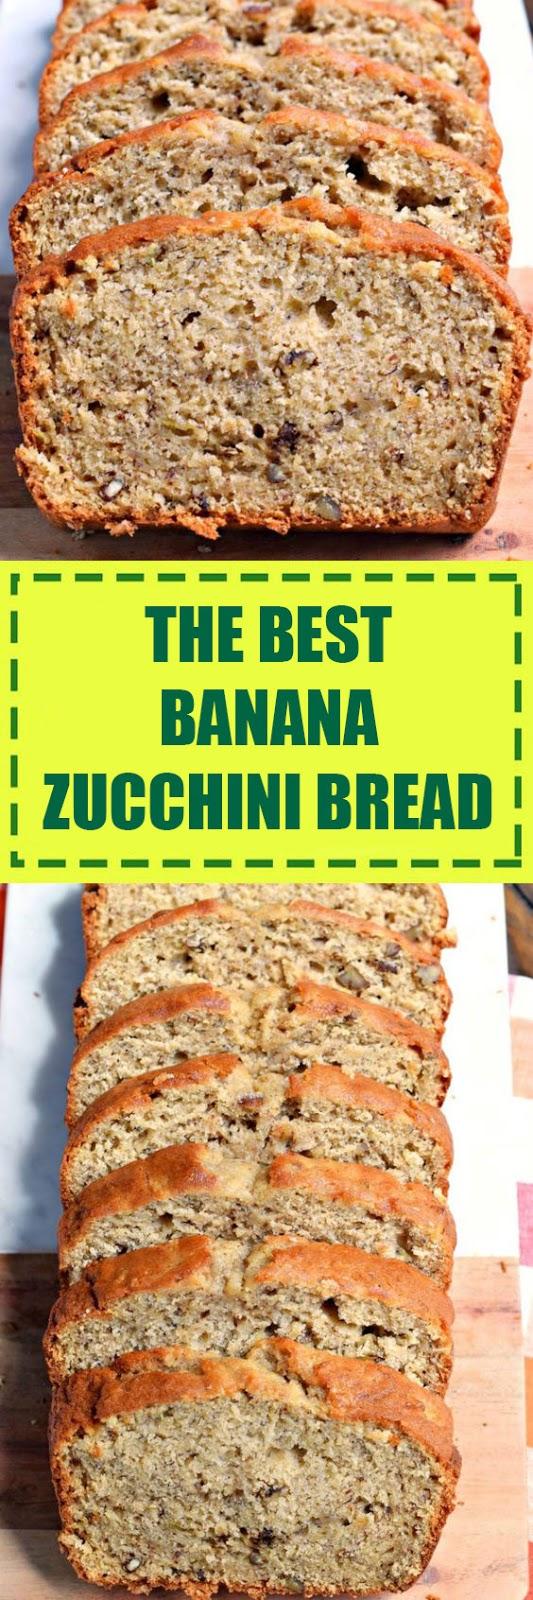 The Best Banana Zucchini Bread